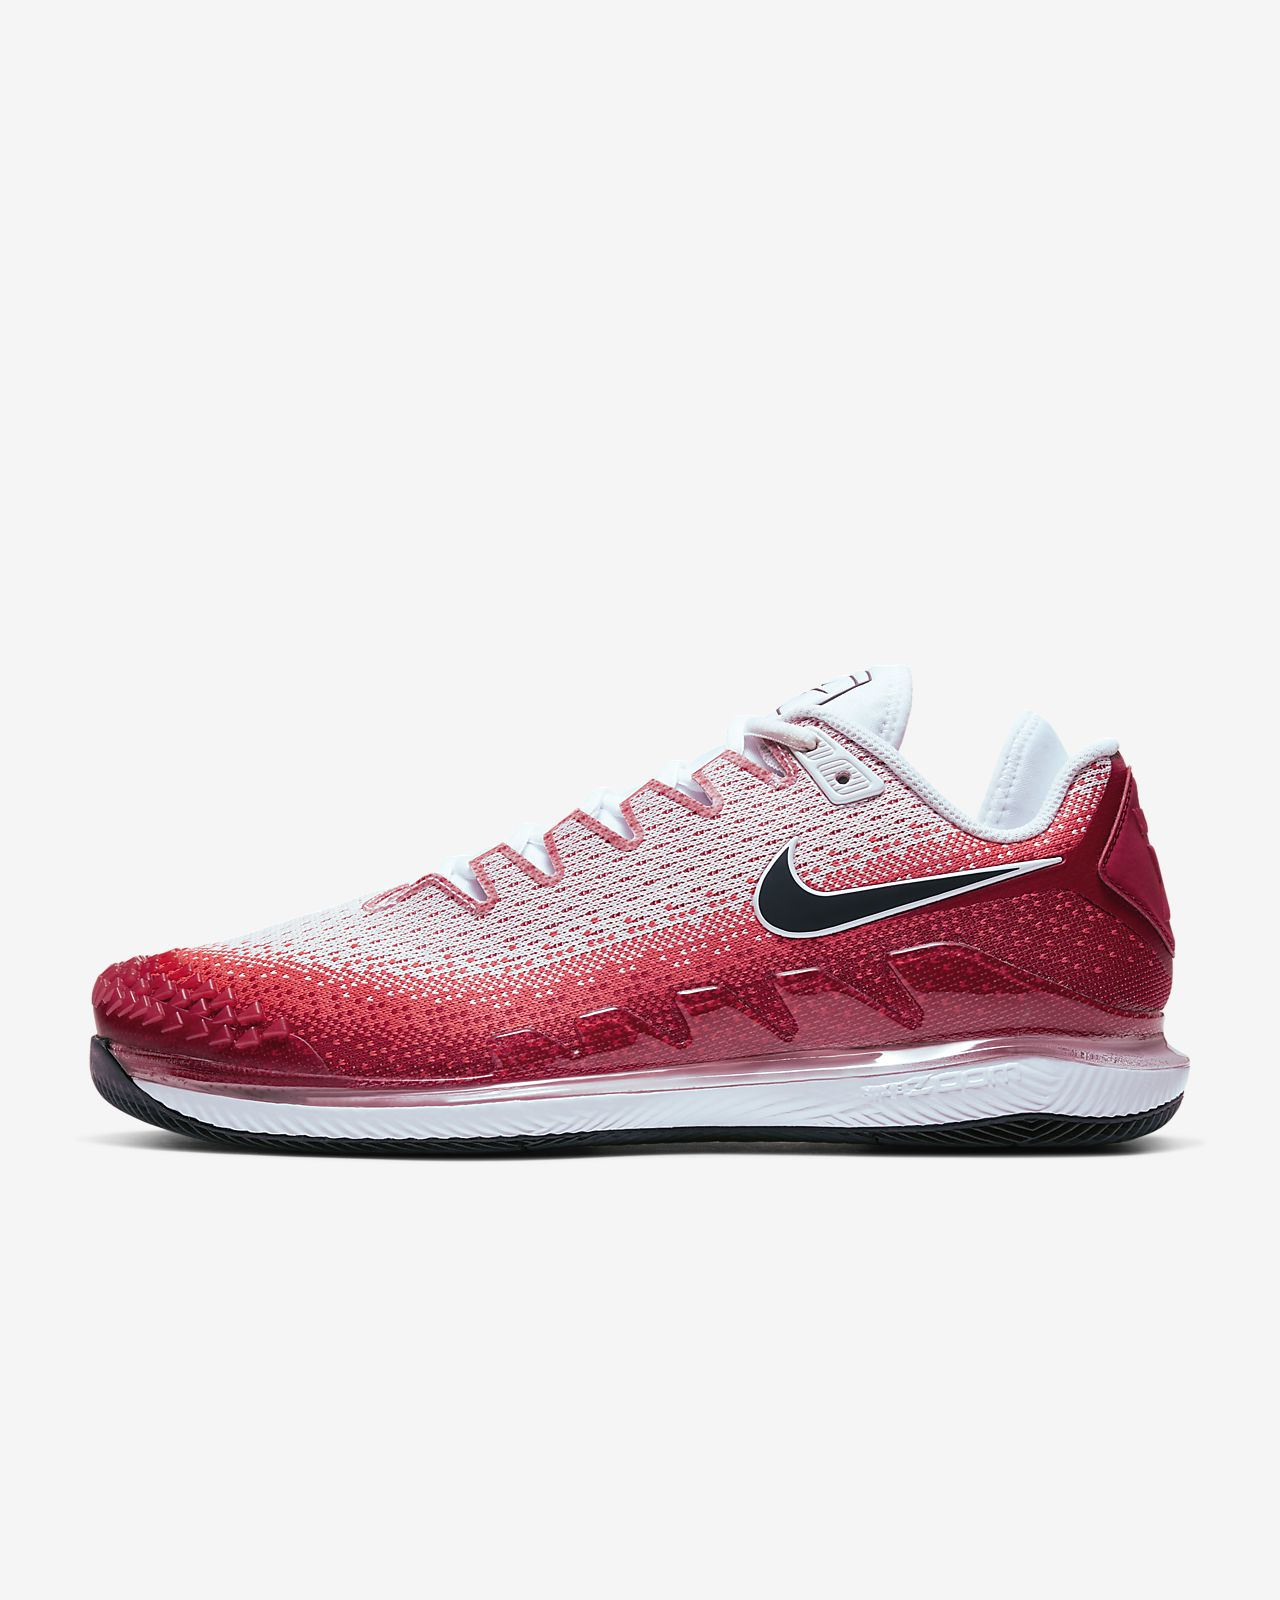 chaussure tennis nike vapor